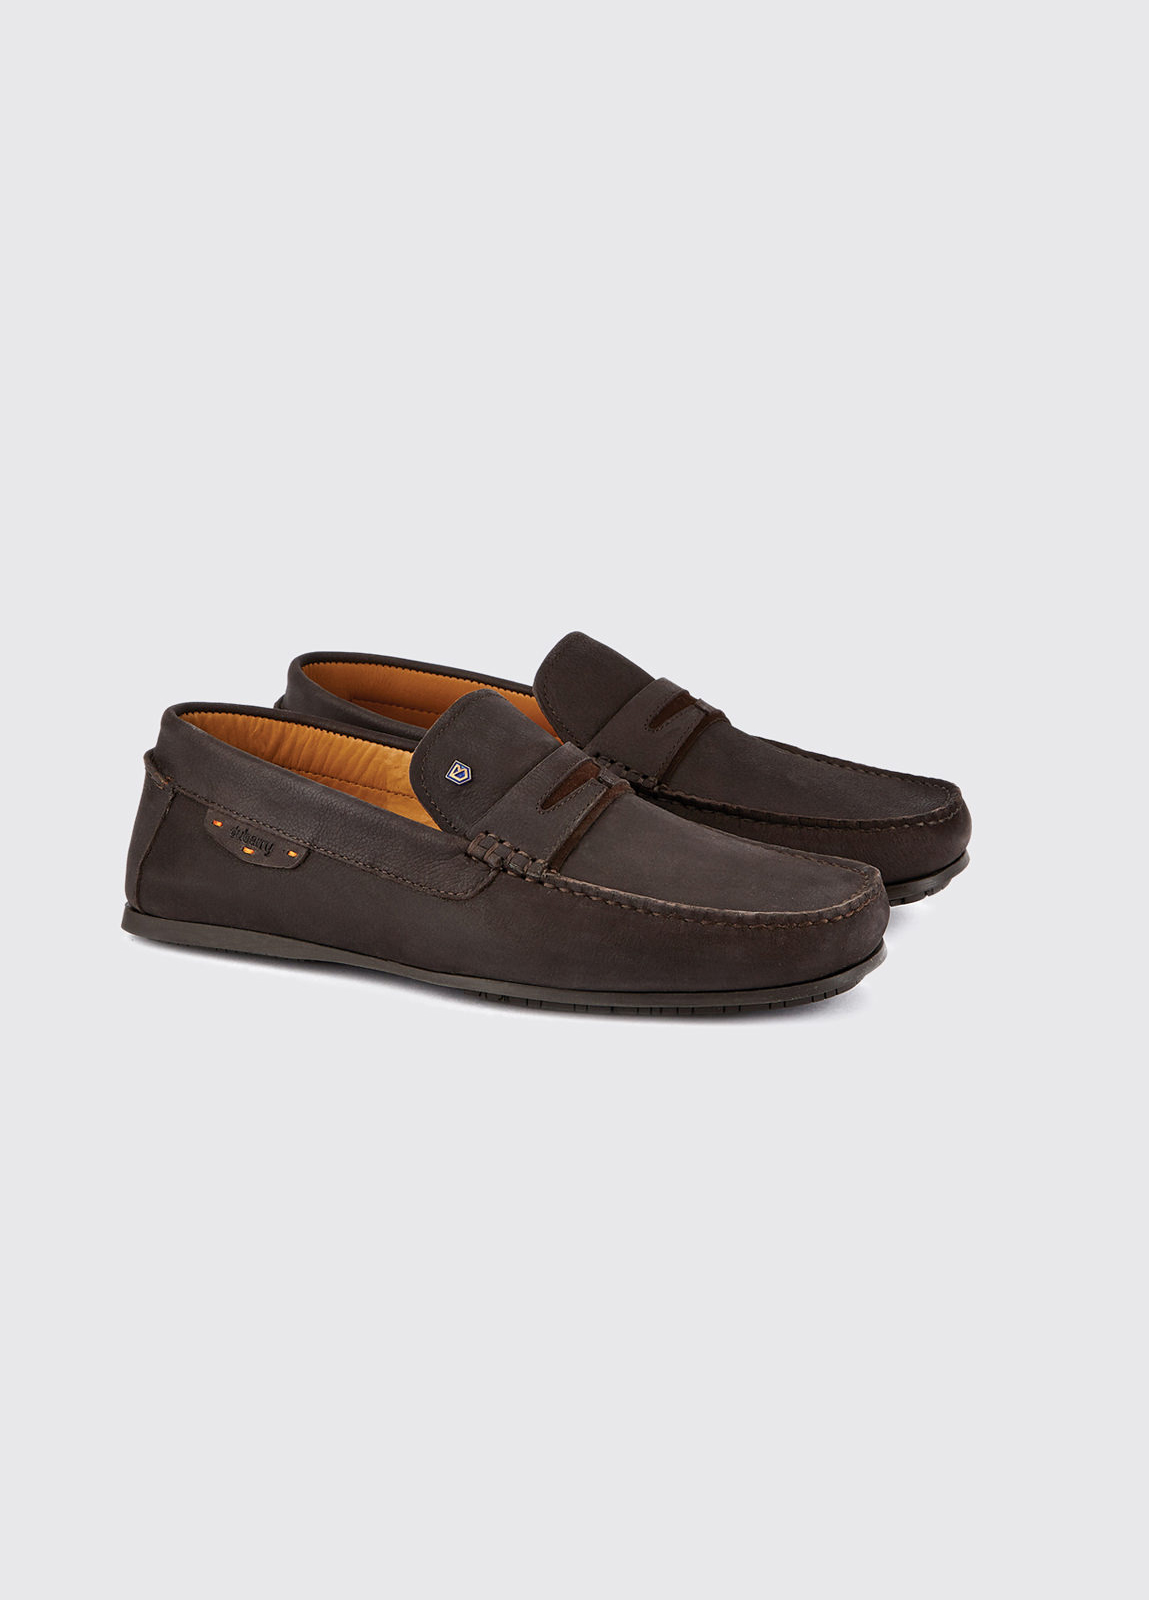 Trinidad Loafer - Teak